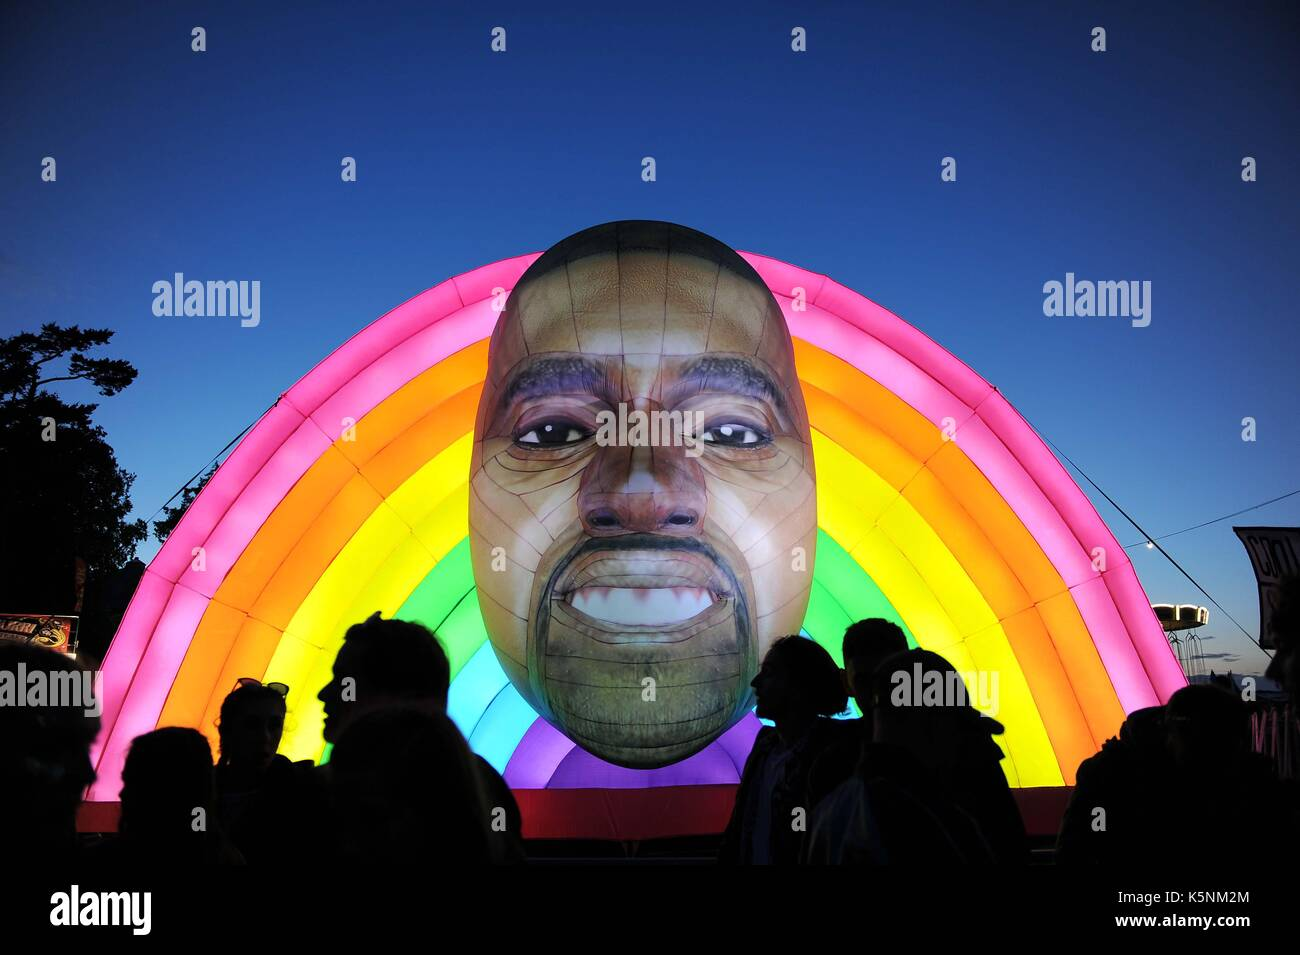 Gonfiabile di Kanye West a bestival music festival. gonfiabile di Kanye West credito: finnbarr webster/alamy live Immagini Stock